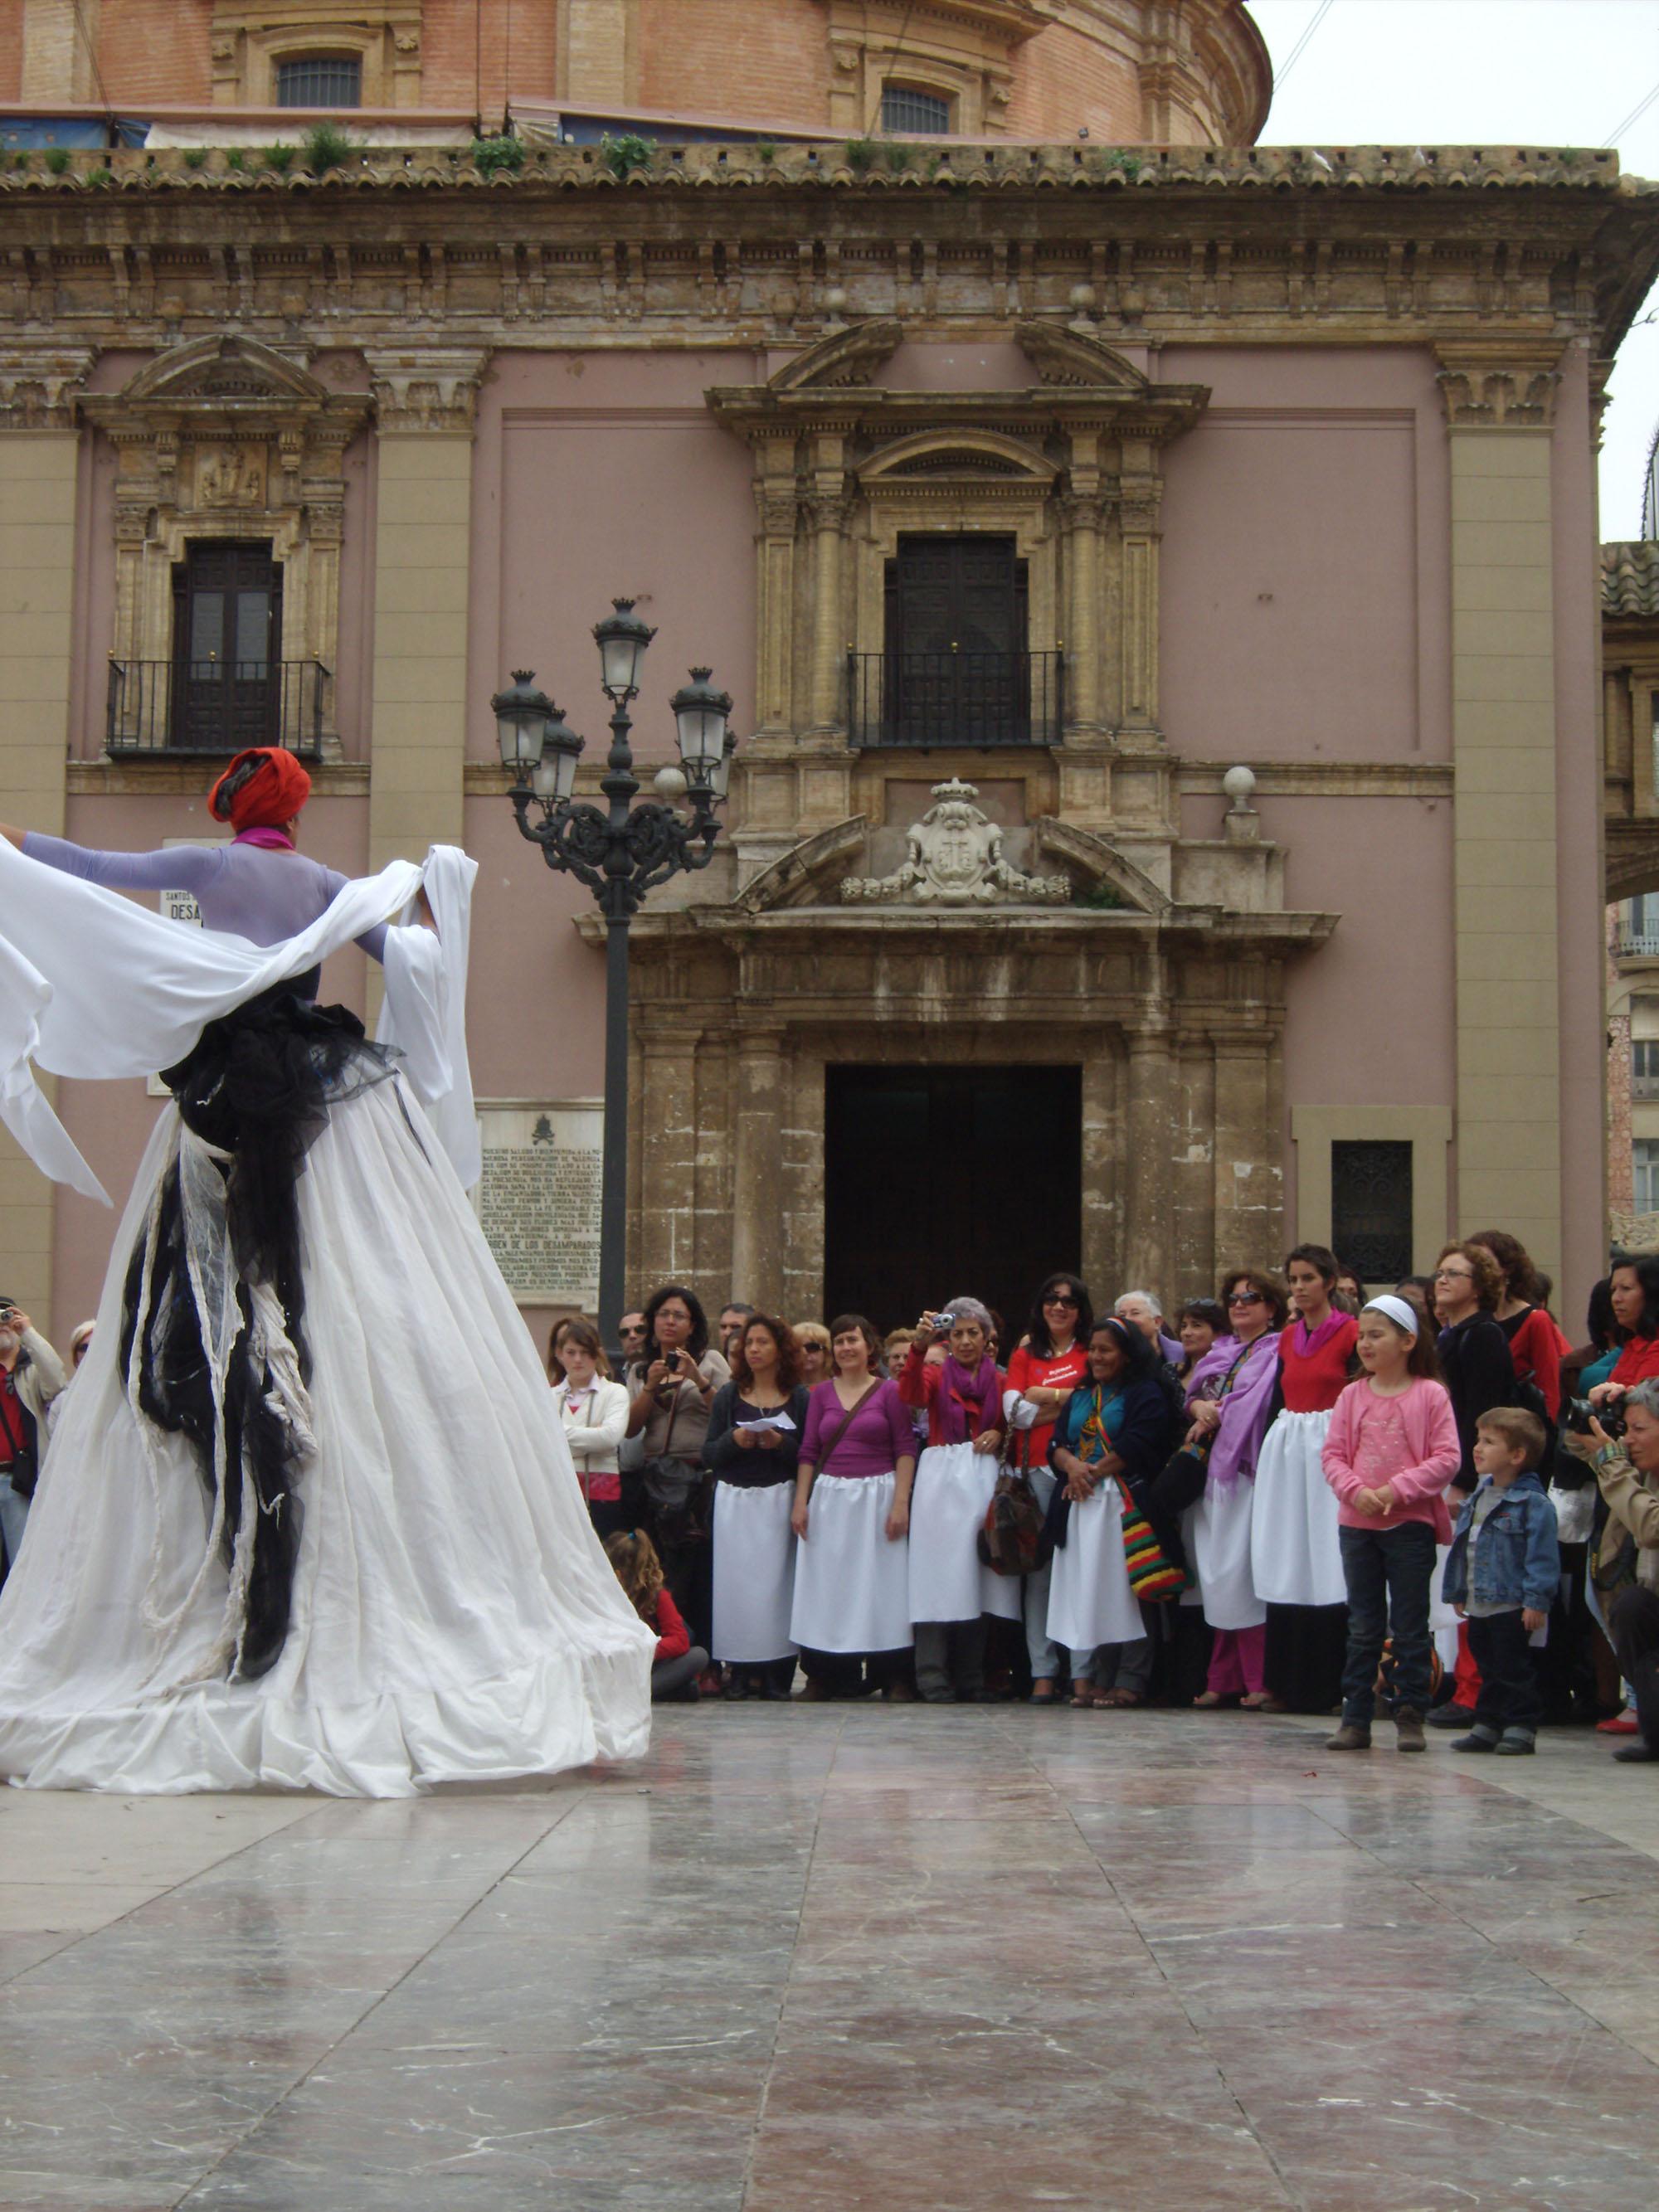 http://ktapress.files.wordpress.com/2011/04/aida-quilcuc3a9-cien-manuelas-valencia-3abril-2011_8.jpg